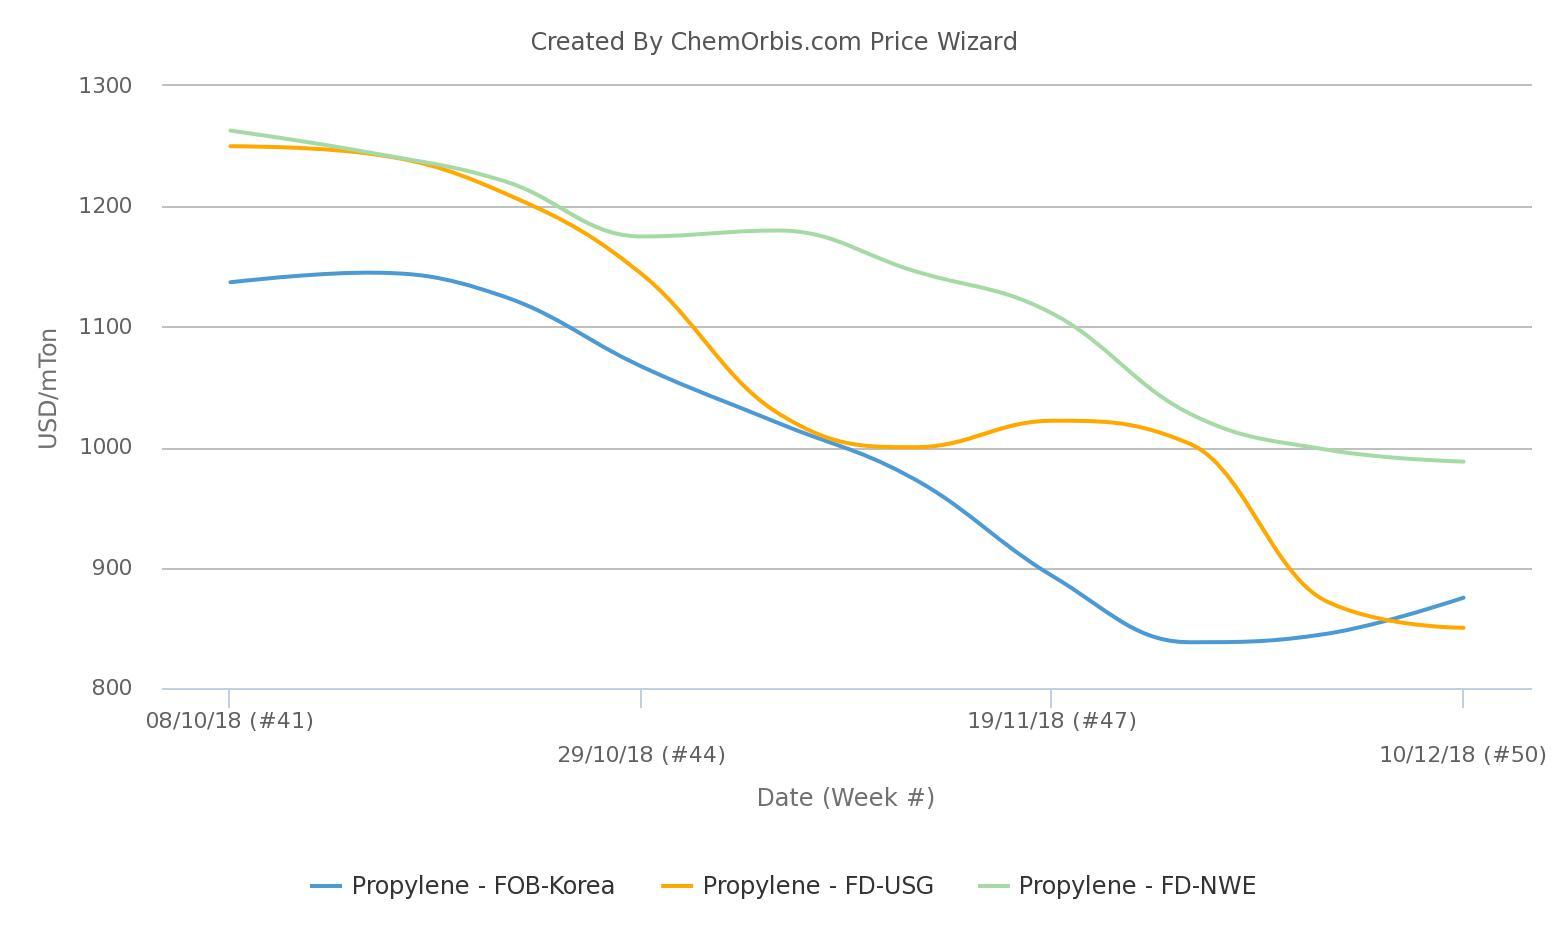 propylene prices